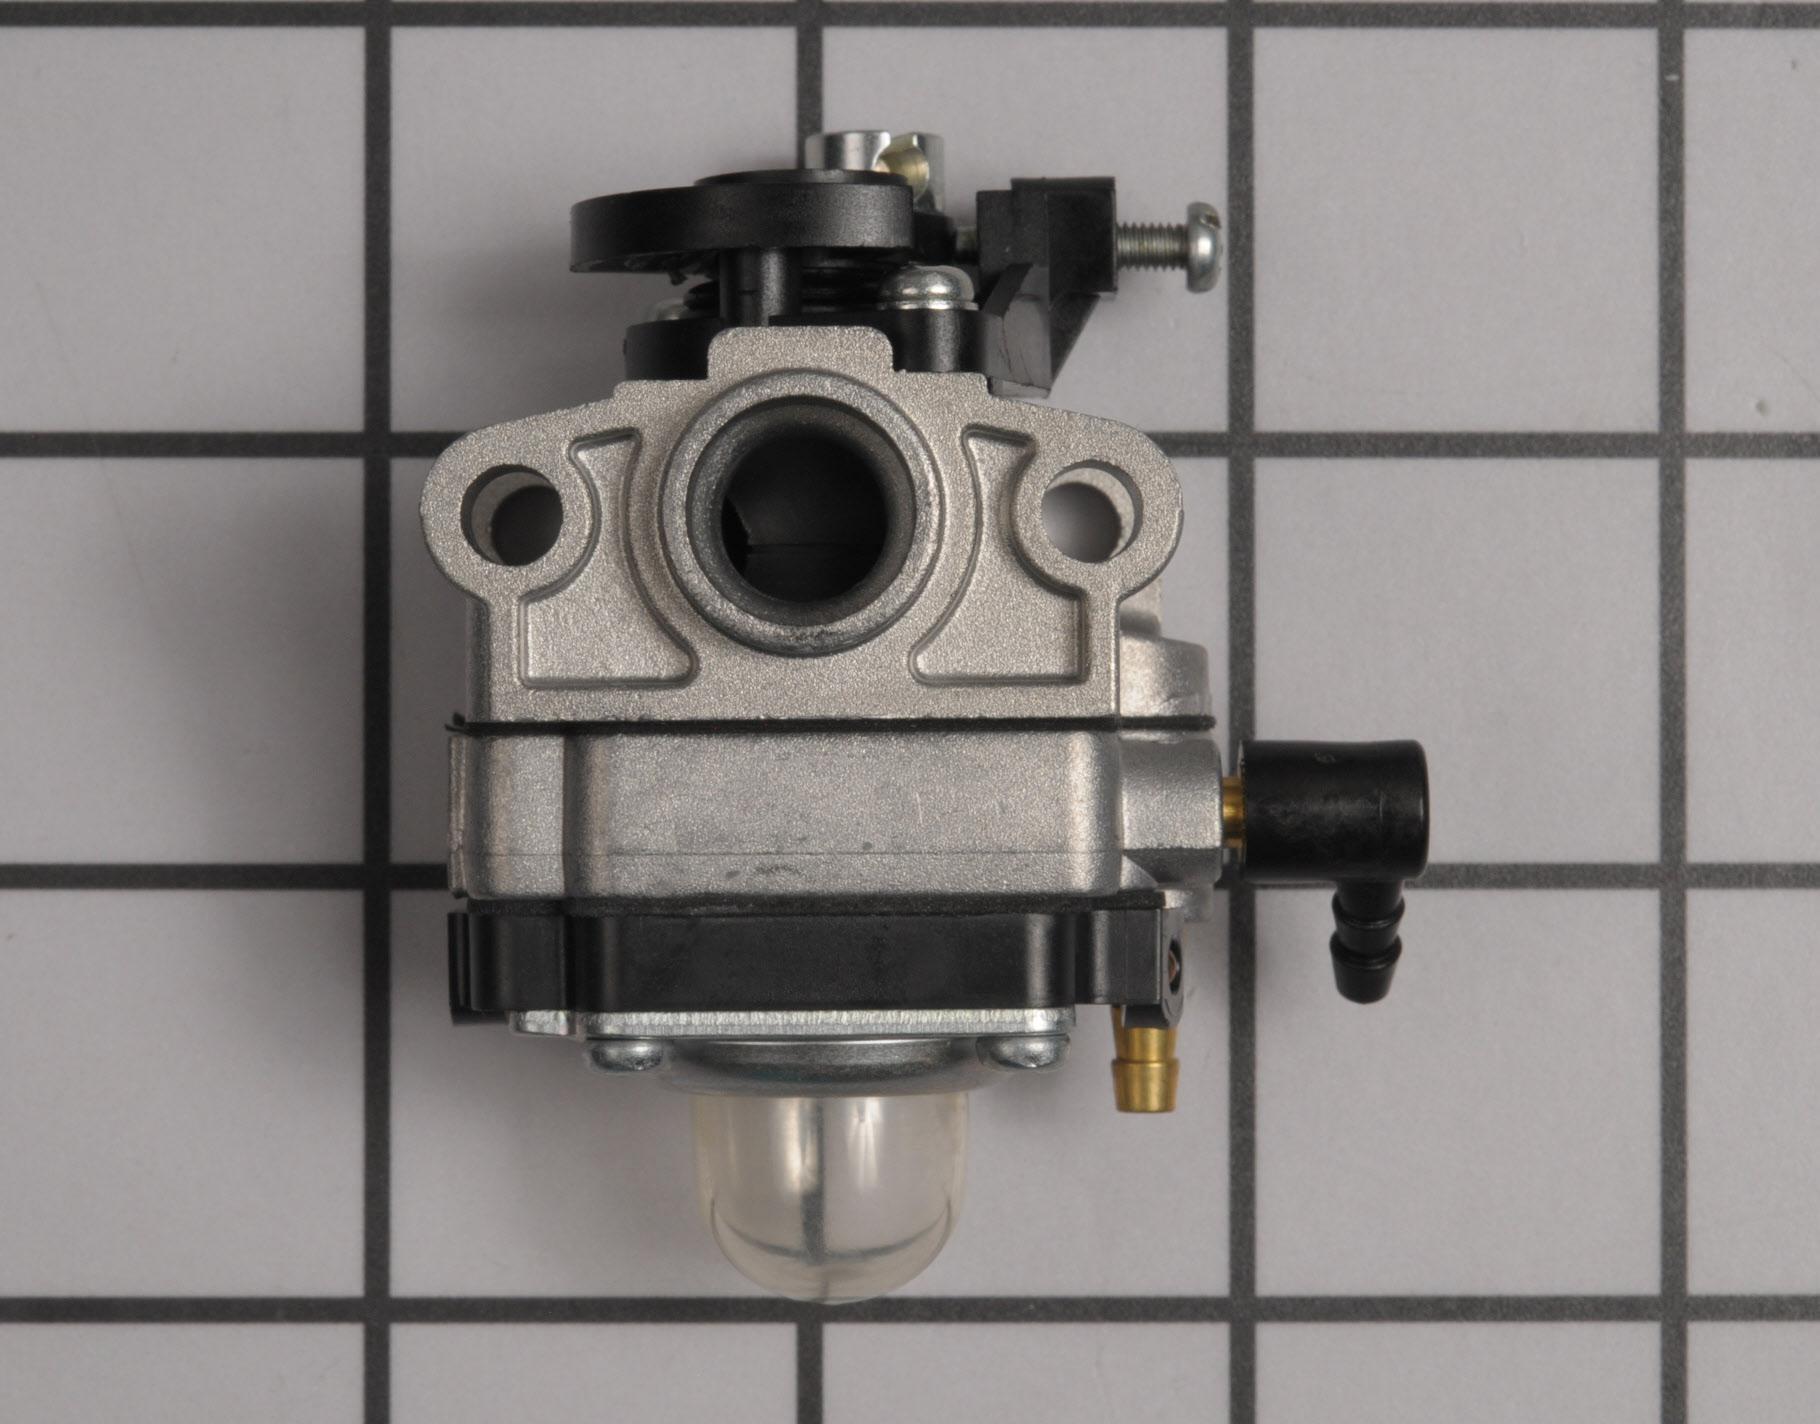 Lawn Mower Part #  - Carburetor - Genuine OEM Part - Troy-Bilt 791-182654